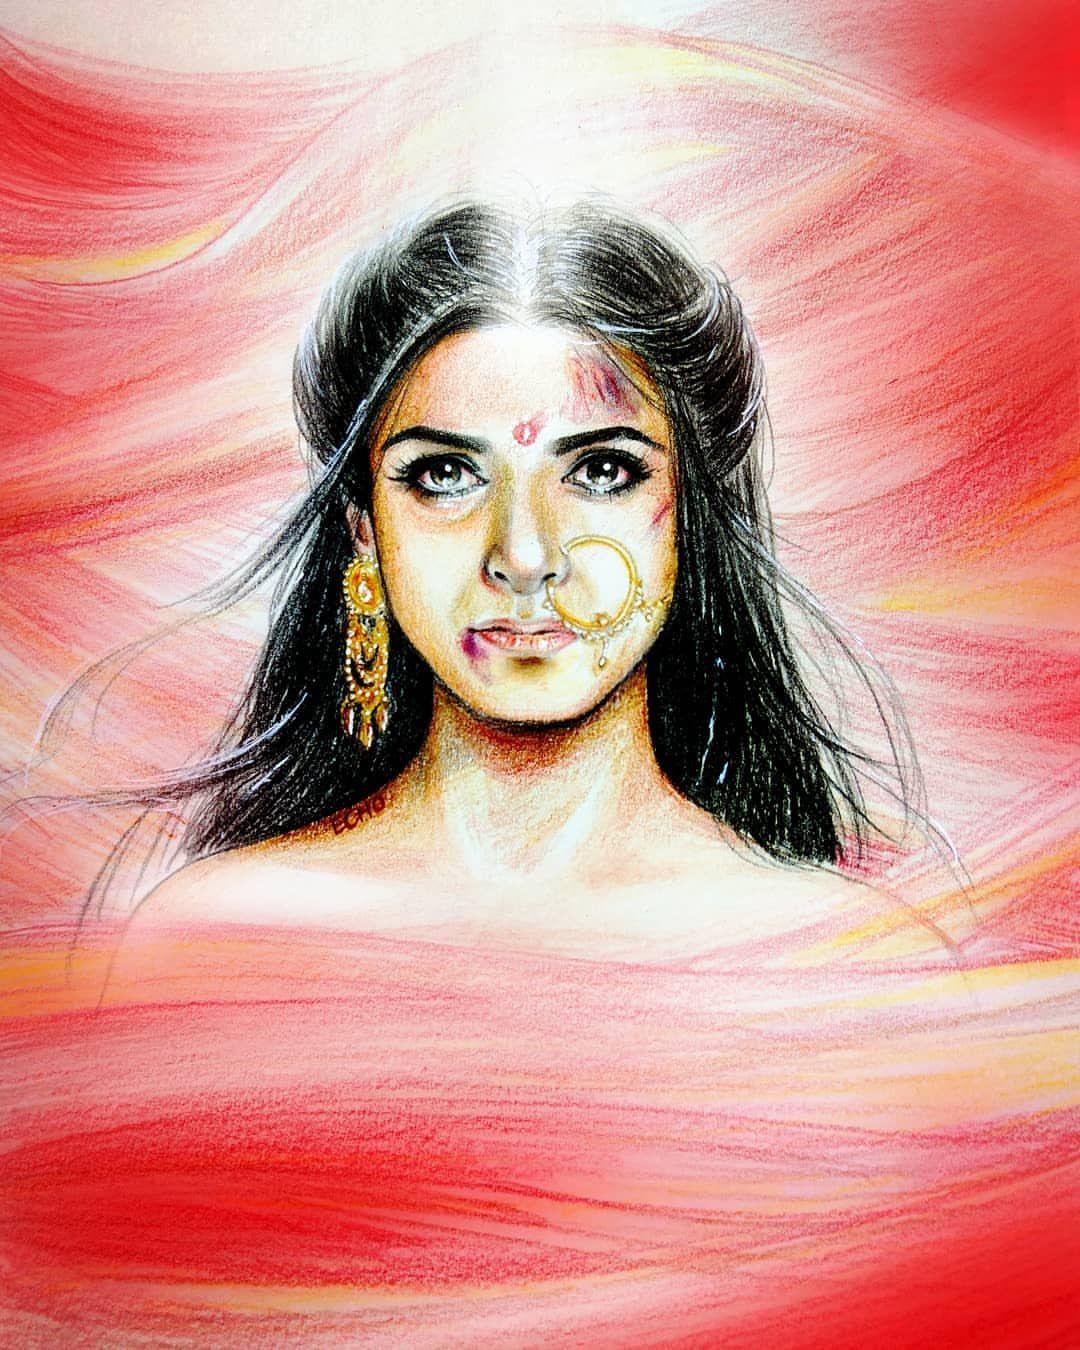 Pin by My Info on Mahabharata and Ramayana | Ganesha art ...